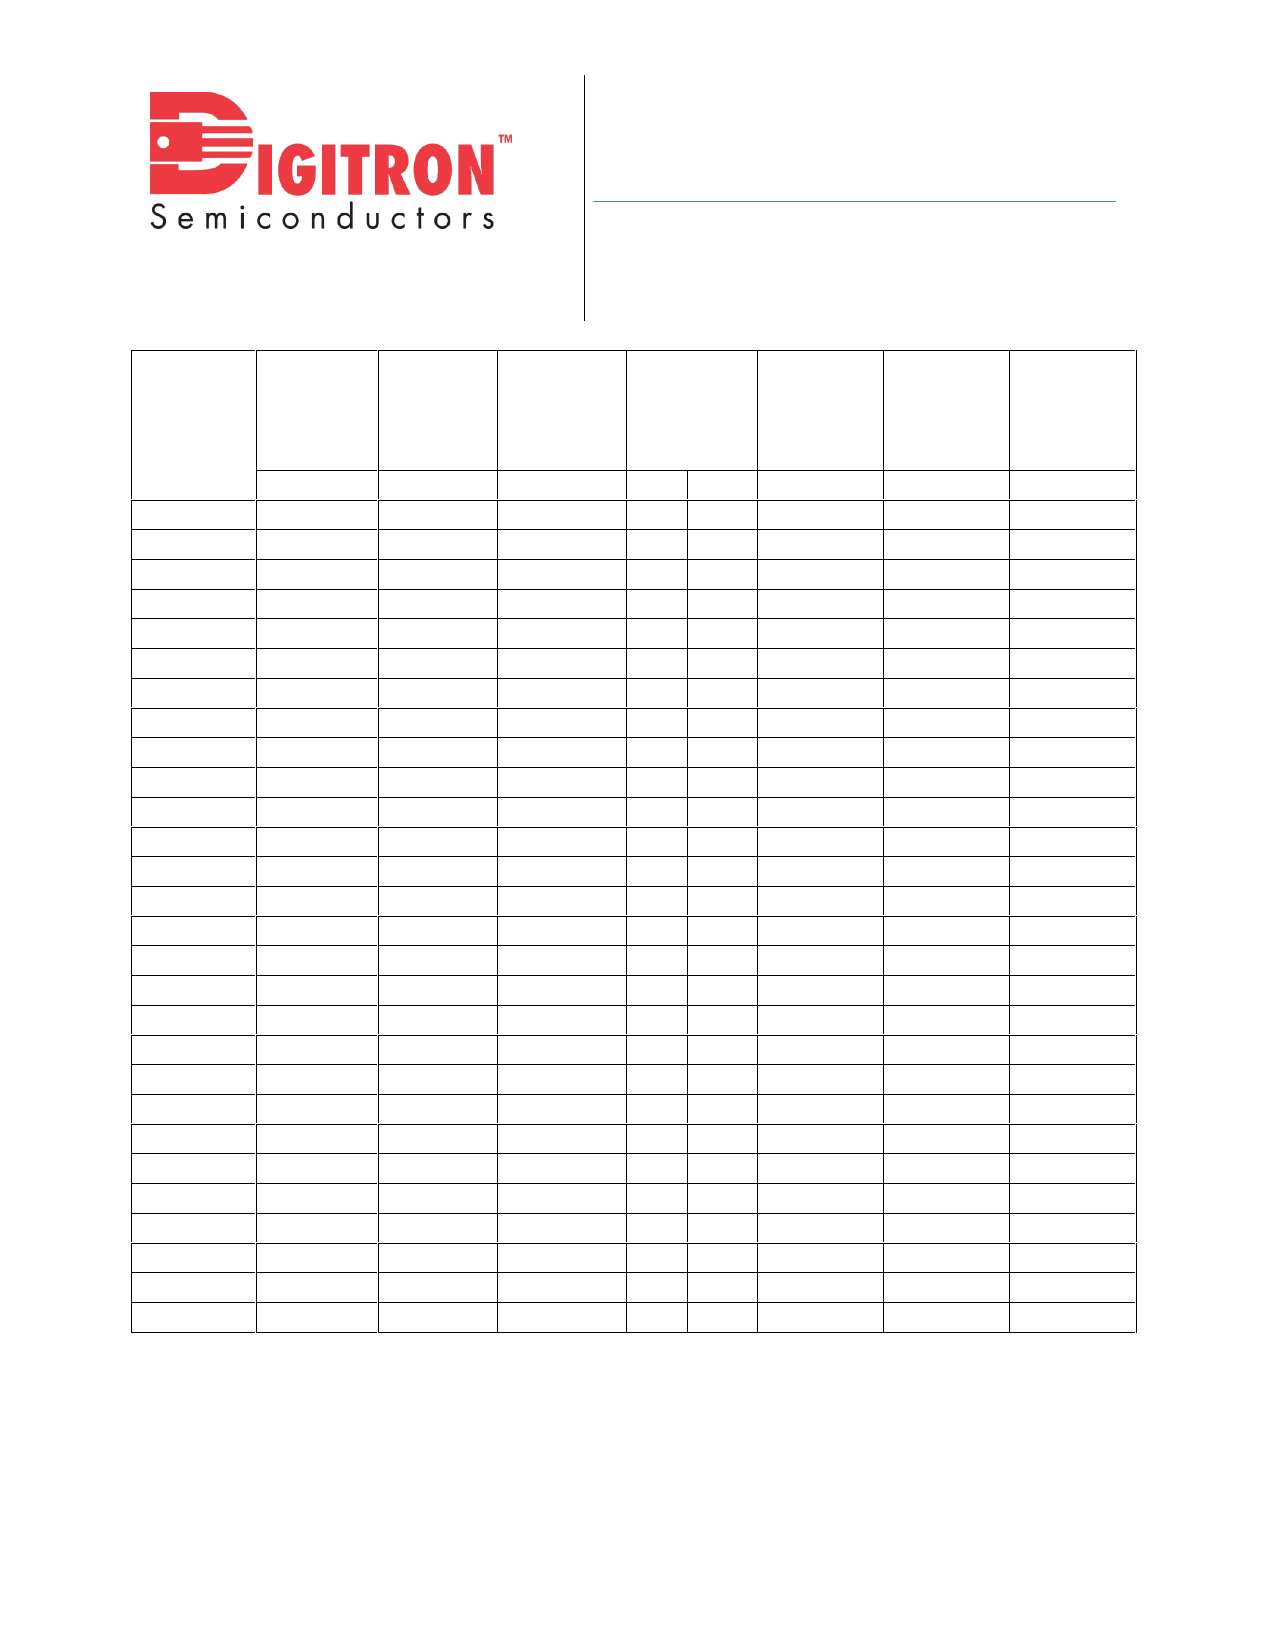 1N4111UR pdf, equivalent, schematic